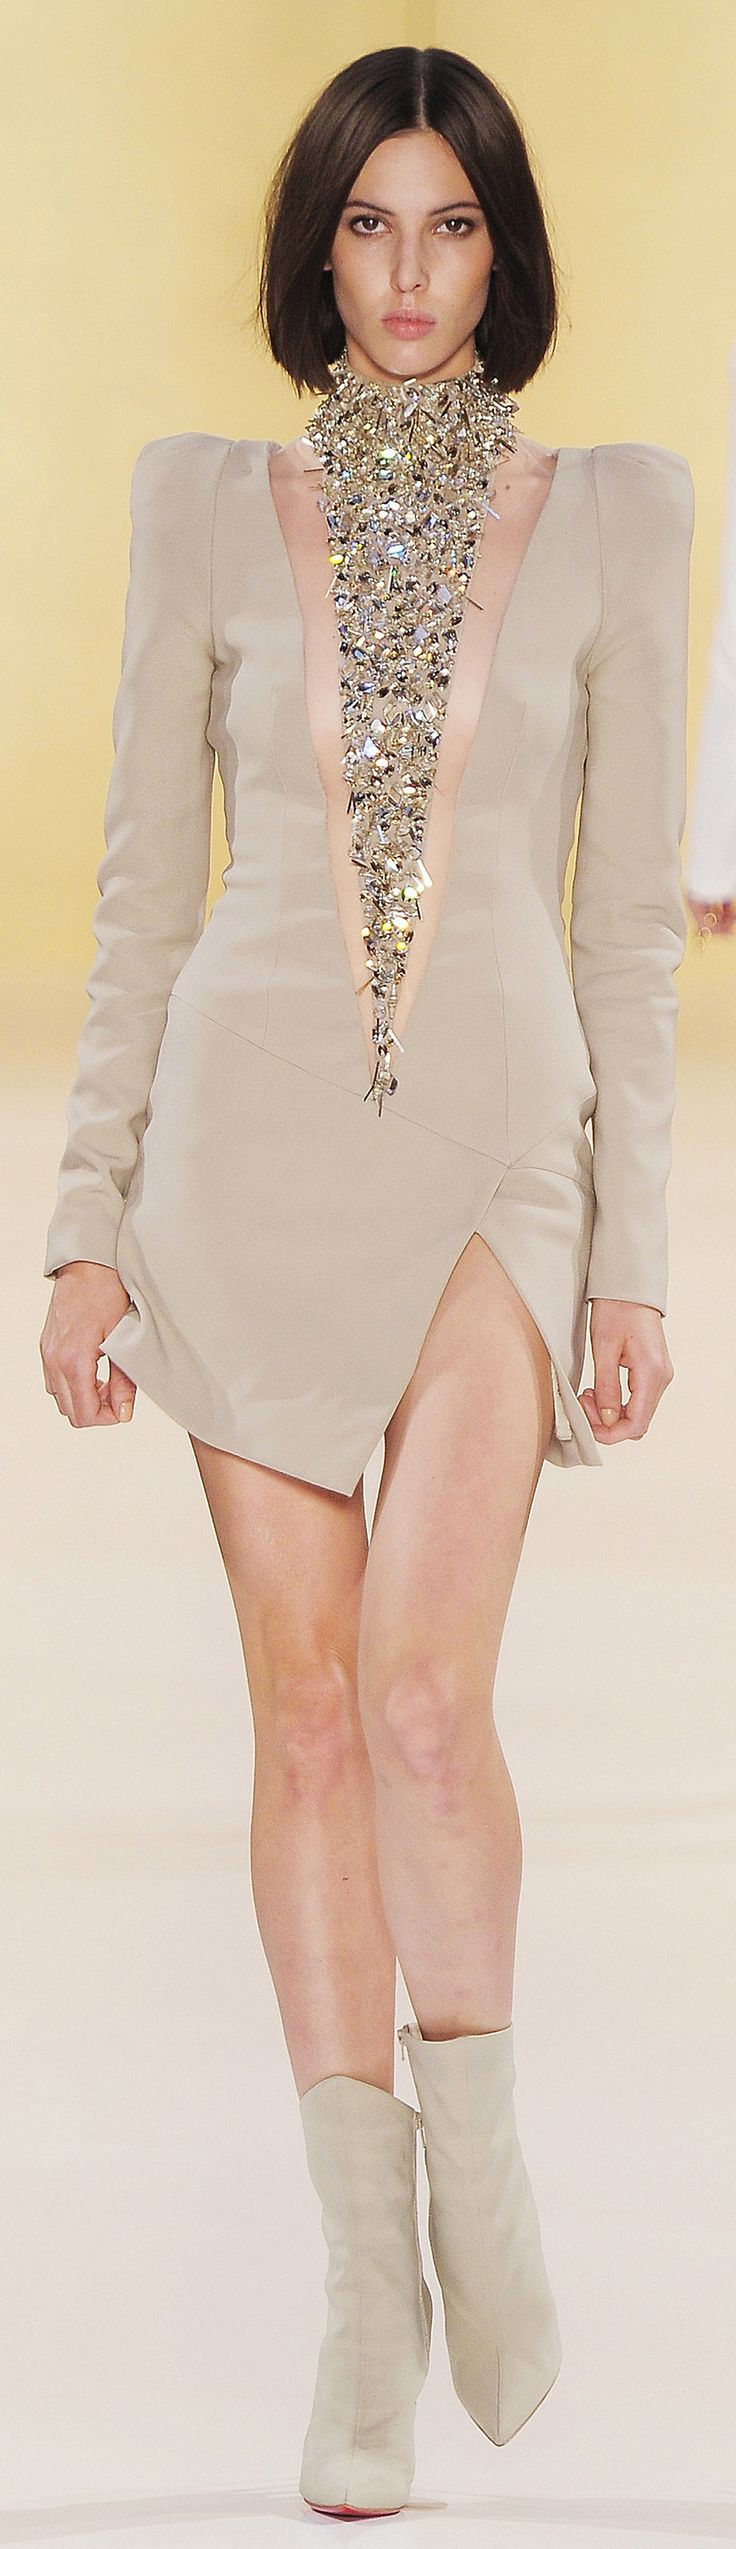 Alexandre Vautier Haute Couture FW 2013 <3<3